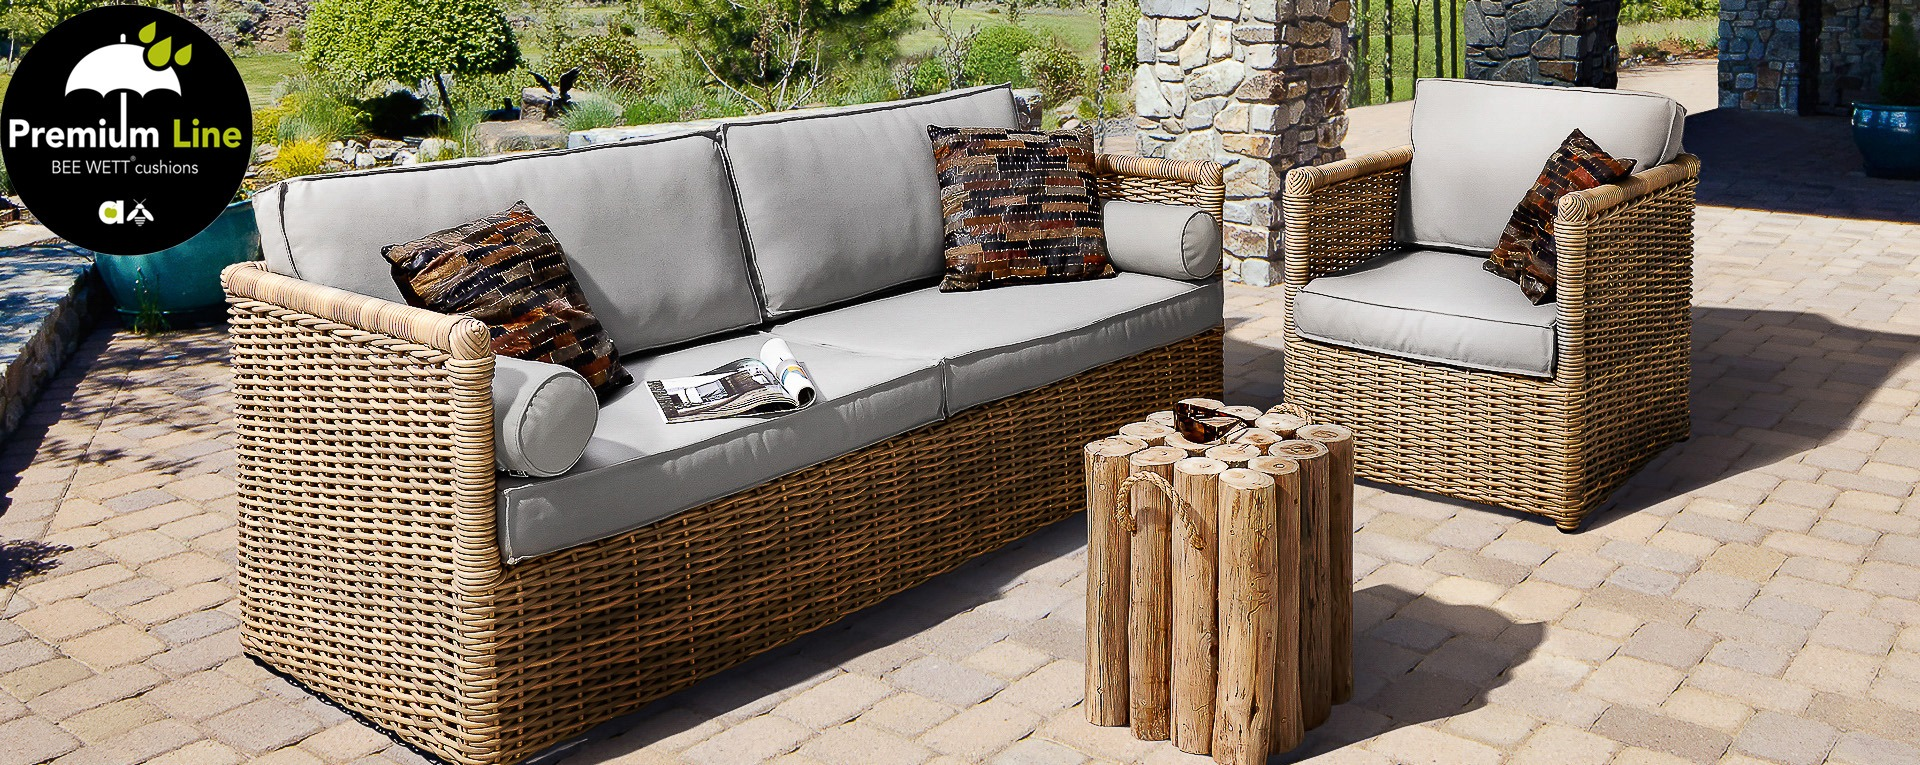 applebee key west loungeset beach premium line best deal tuinmeubelen. Black Bedroom Furniture Sets. Home Design Ideas